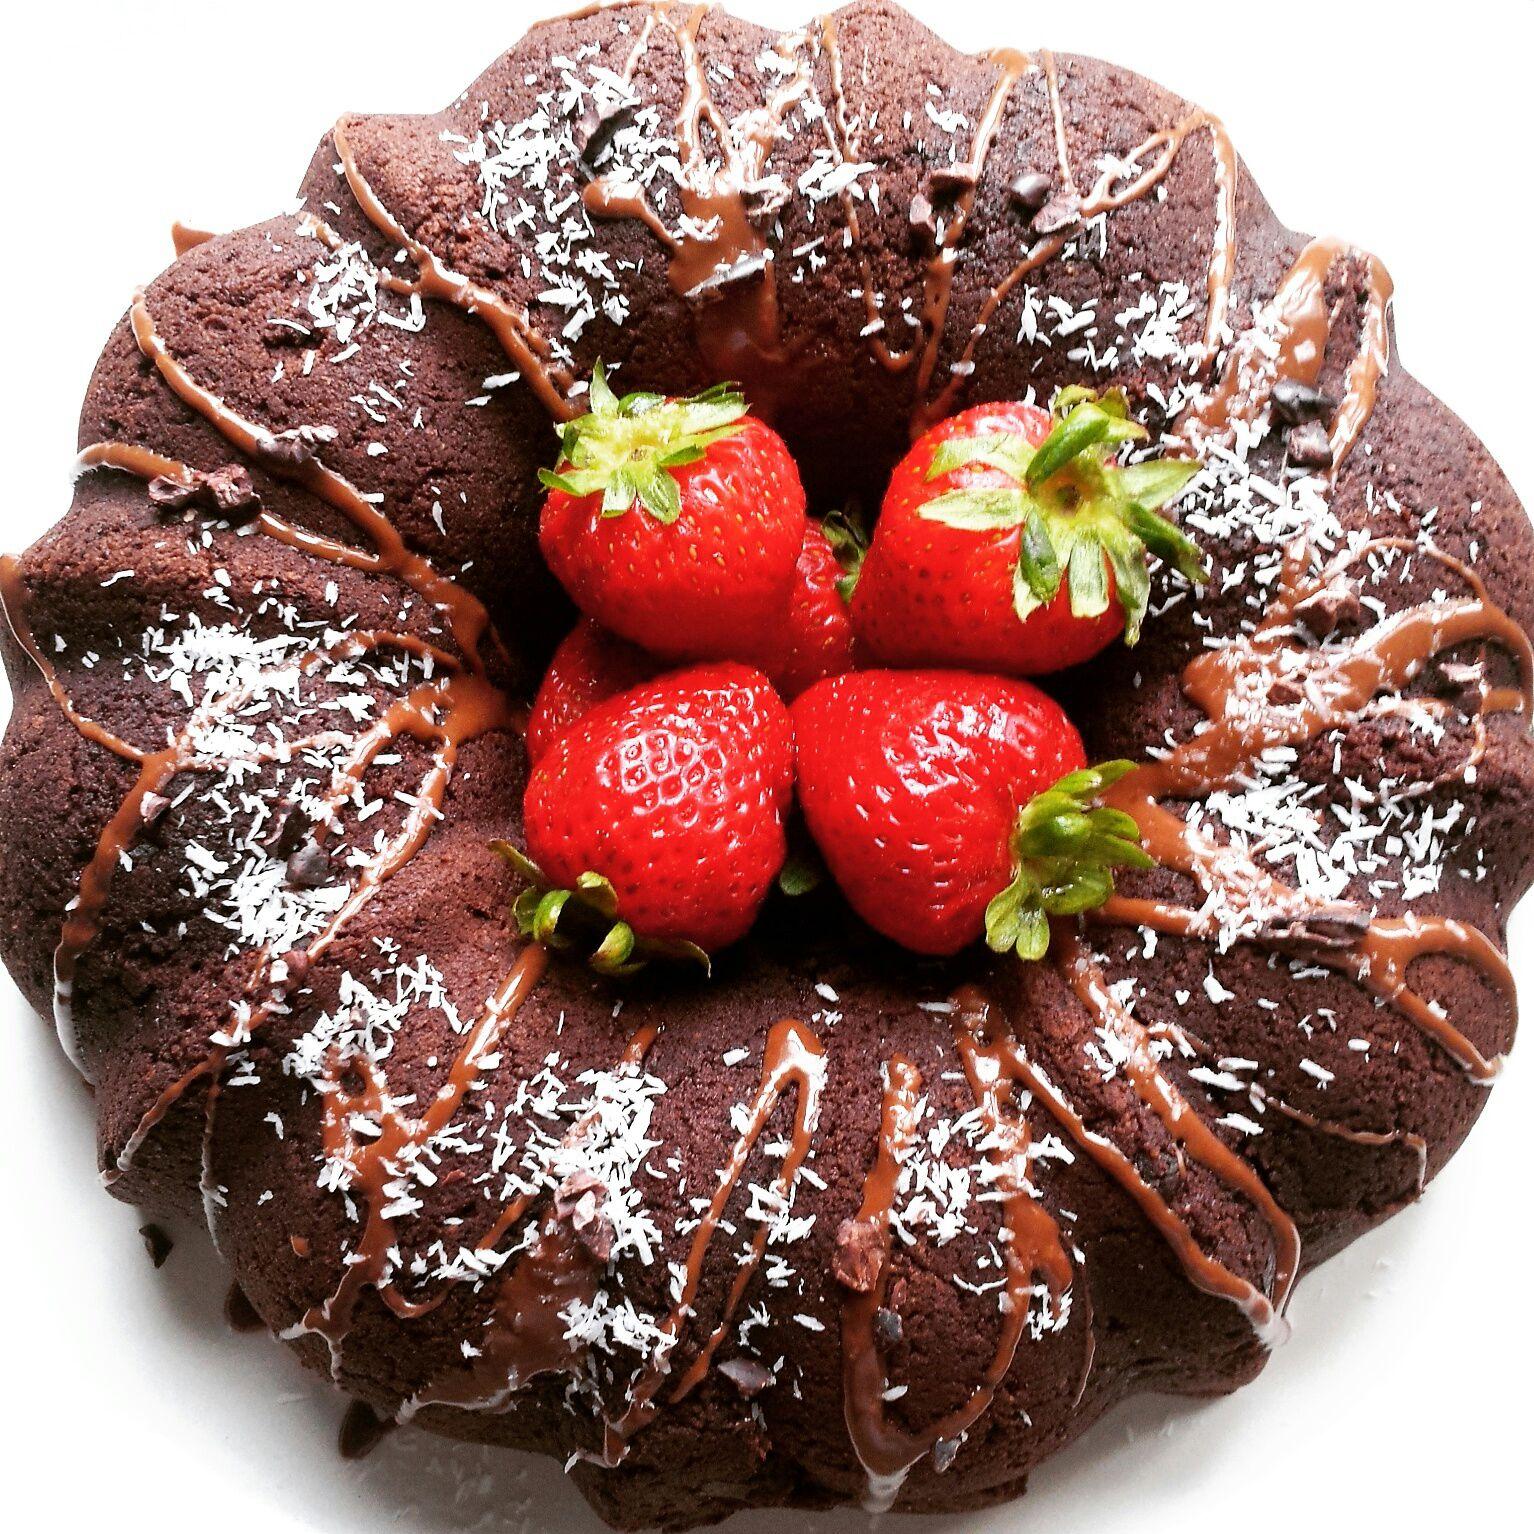 Gluten Free, Vegan Coconut Chocolate Cake